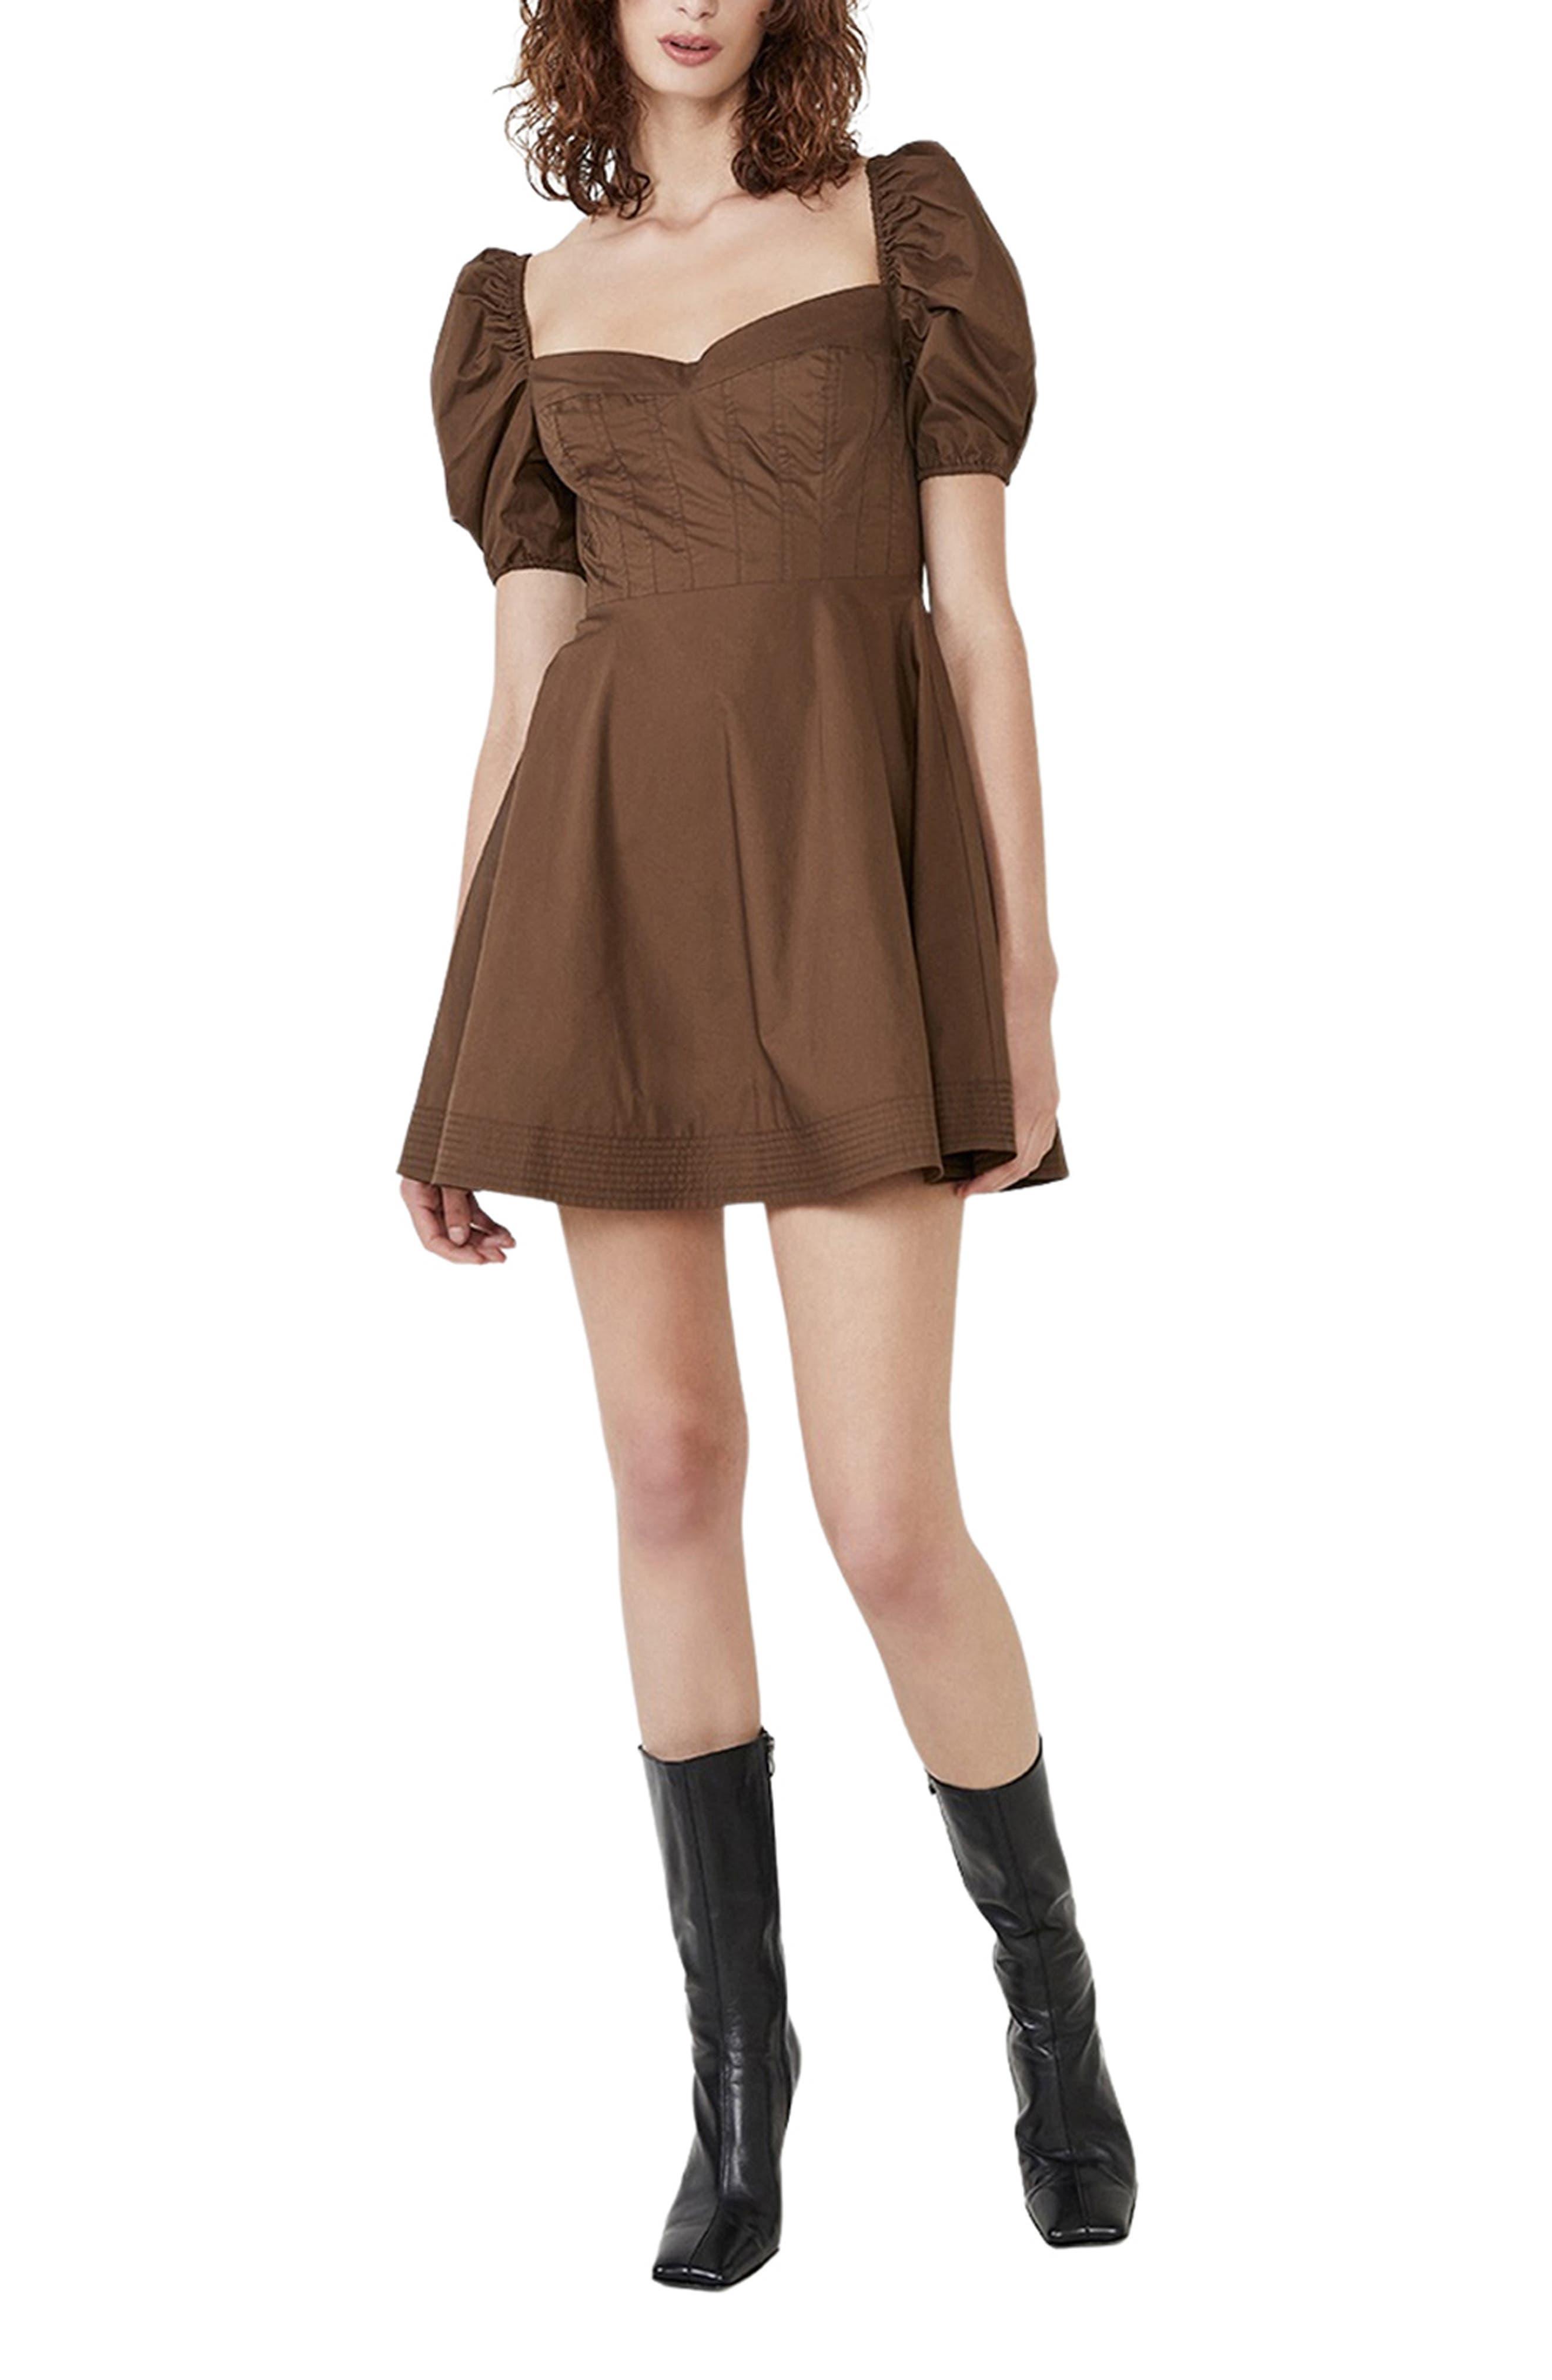 The Corset Puff Sleeve Cotton Blend Minidress